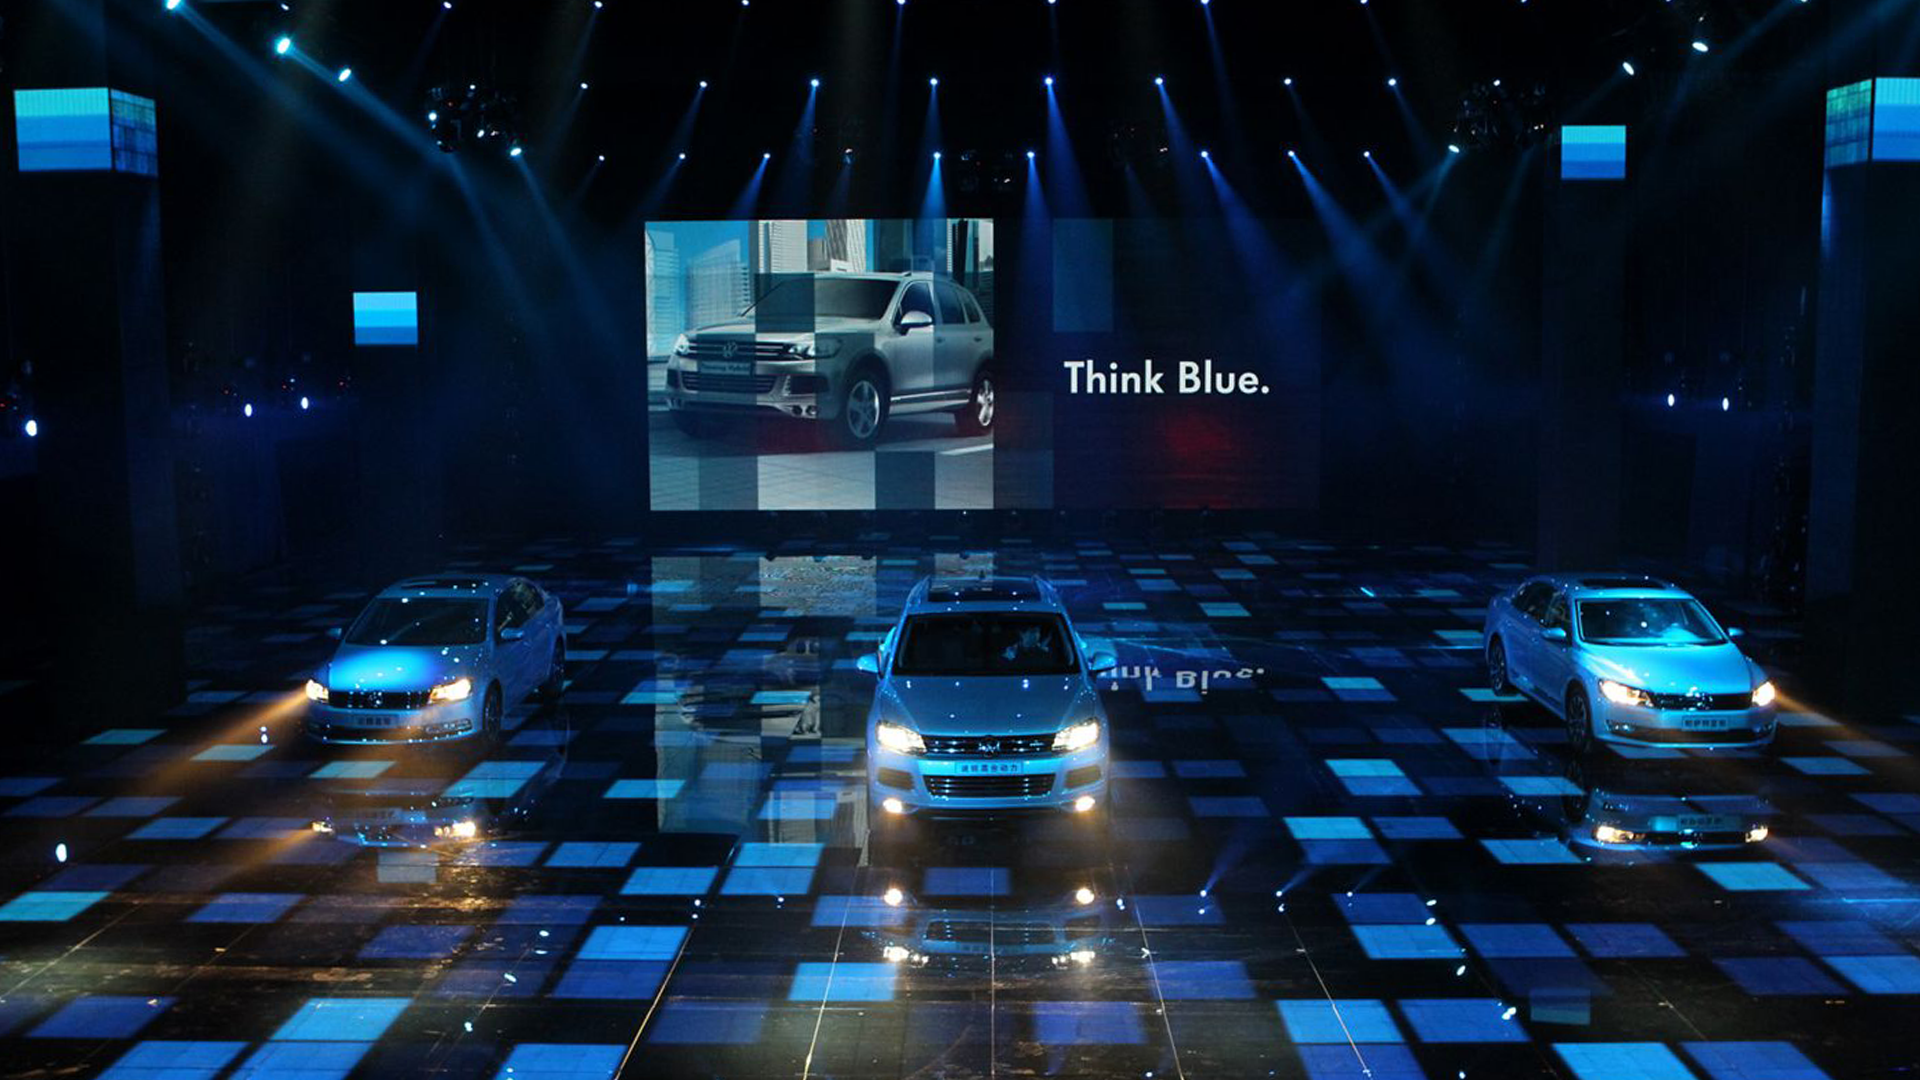 VWGG_Think blue